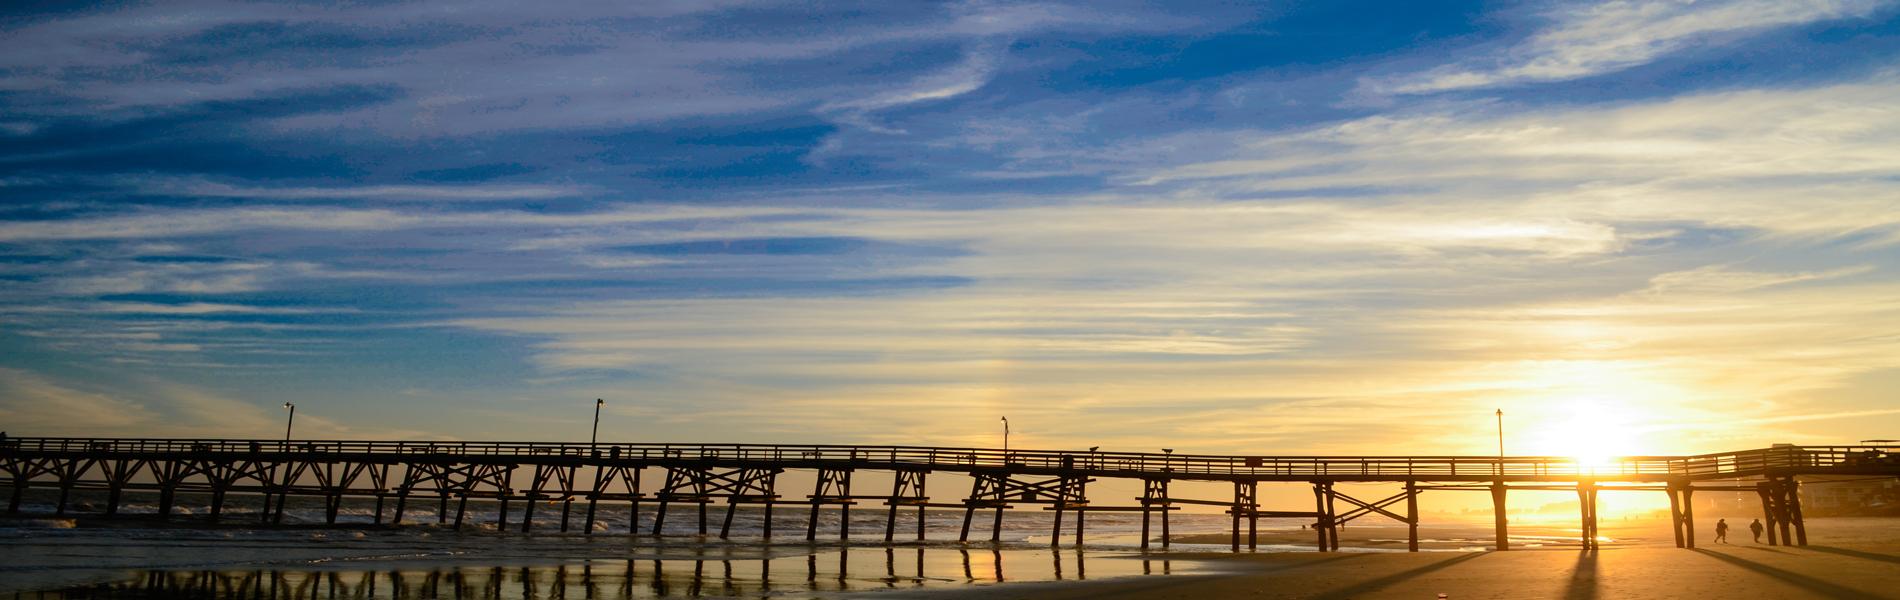 Cherry Grove Beach Vacations